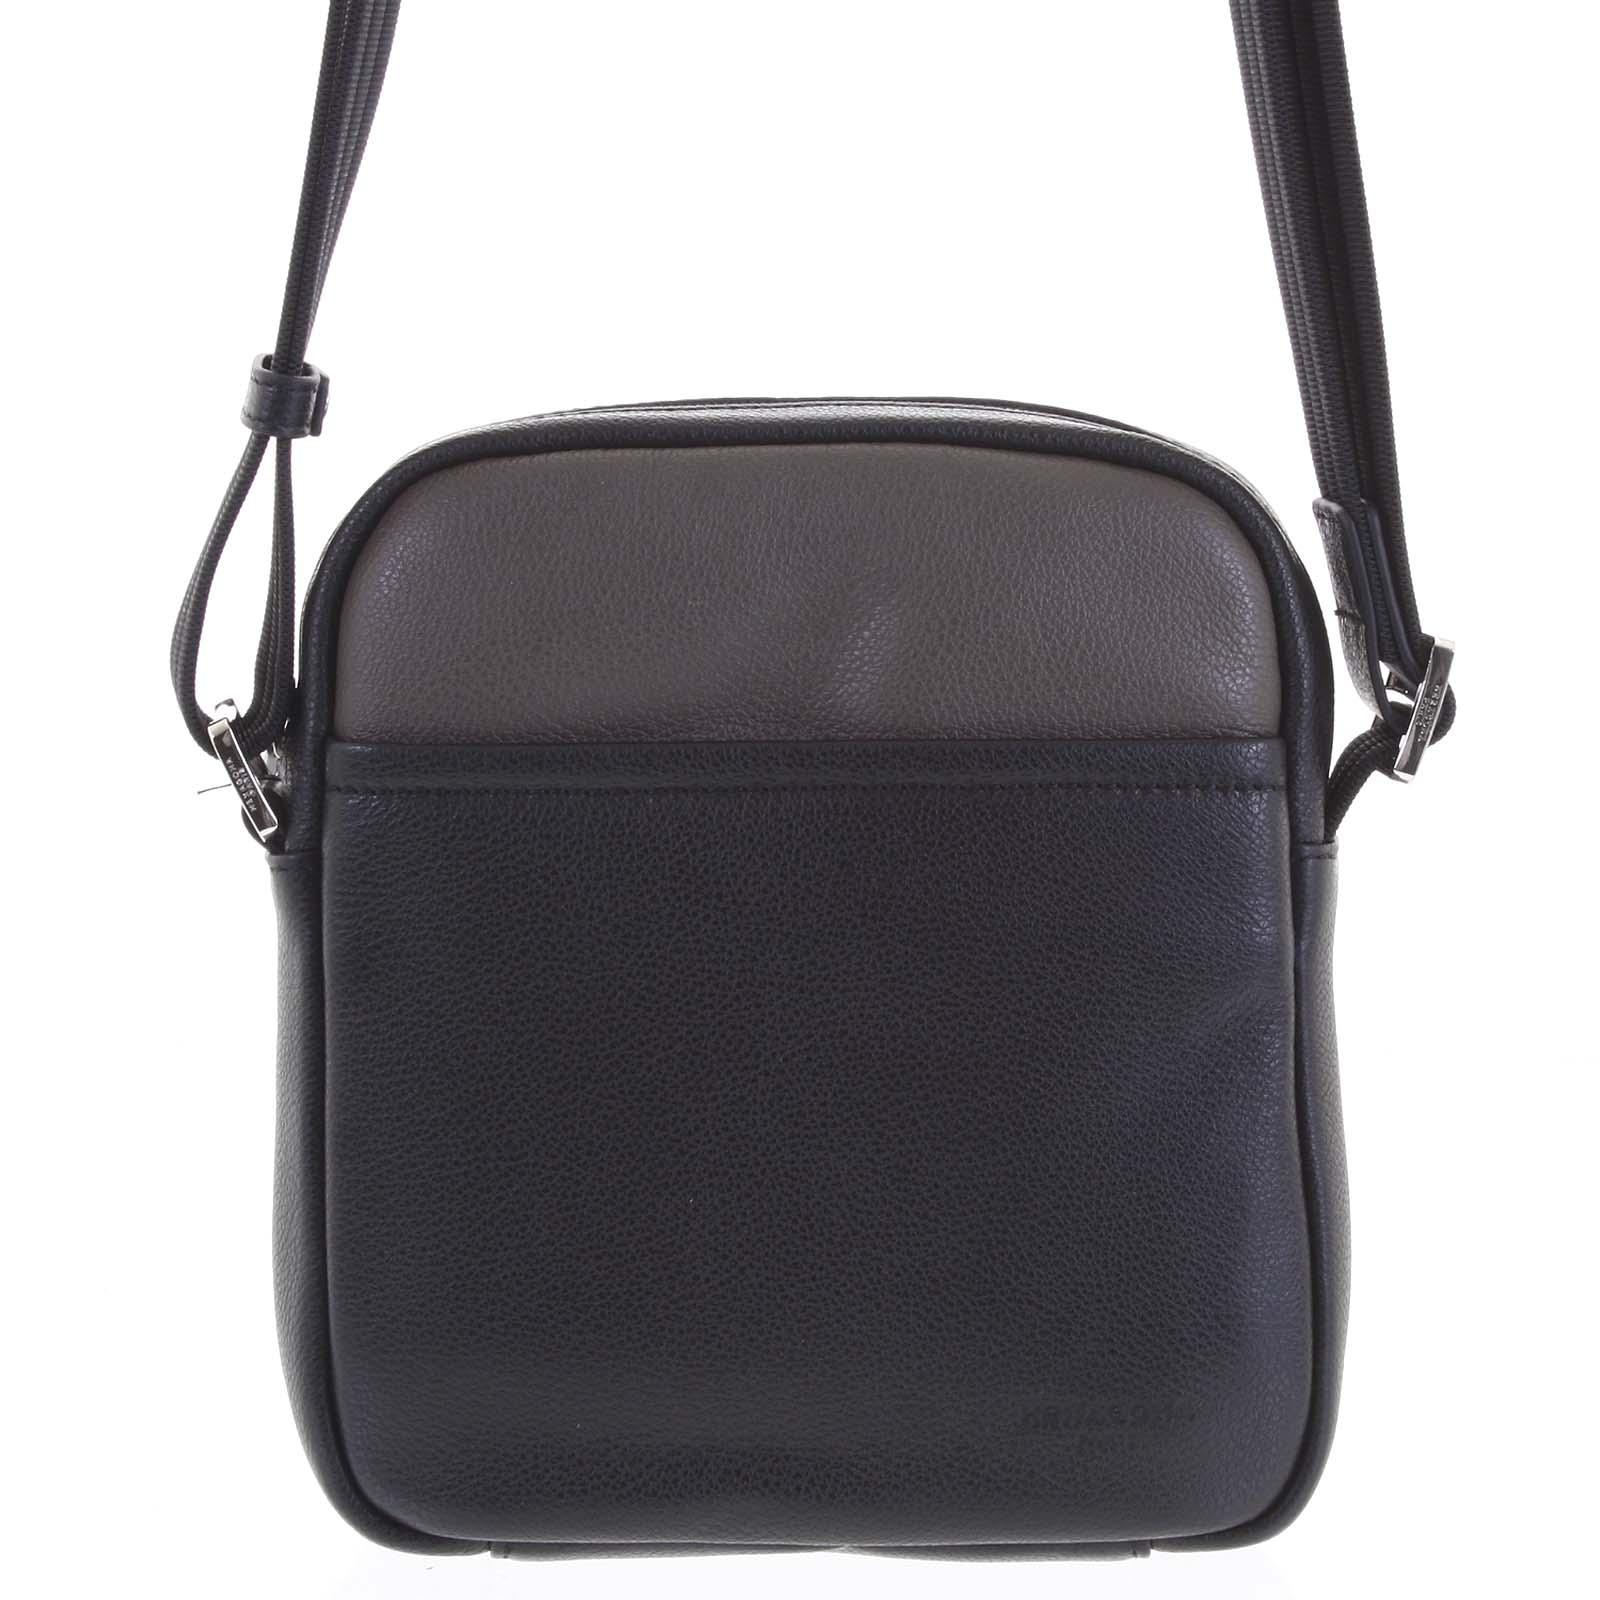 Pánská kožená taška na doklady černá taupe - Hexagona Thursday